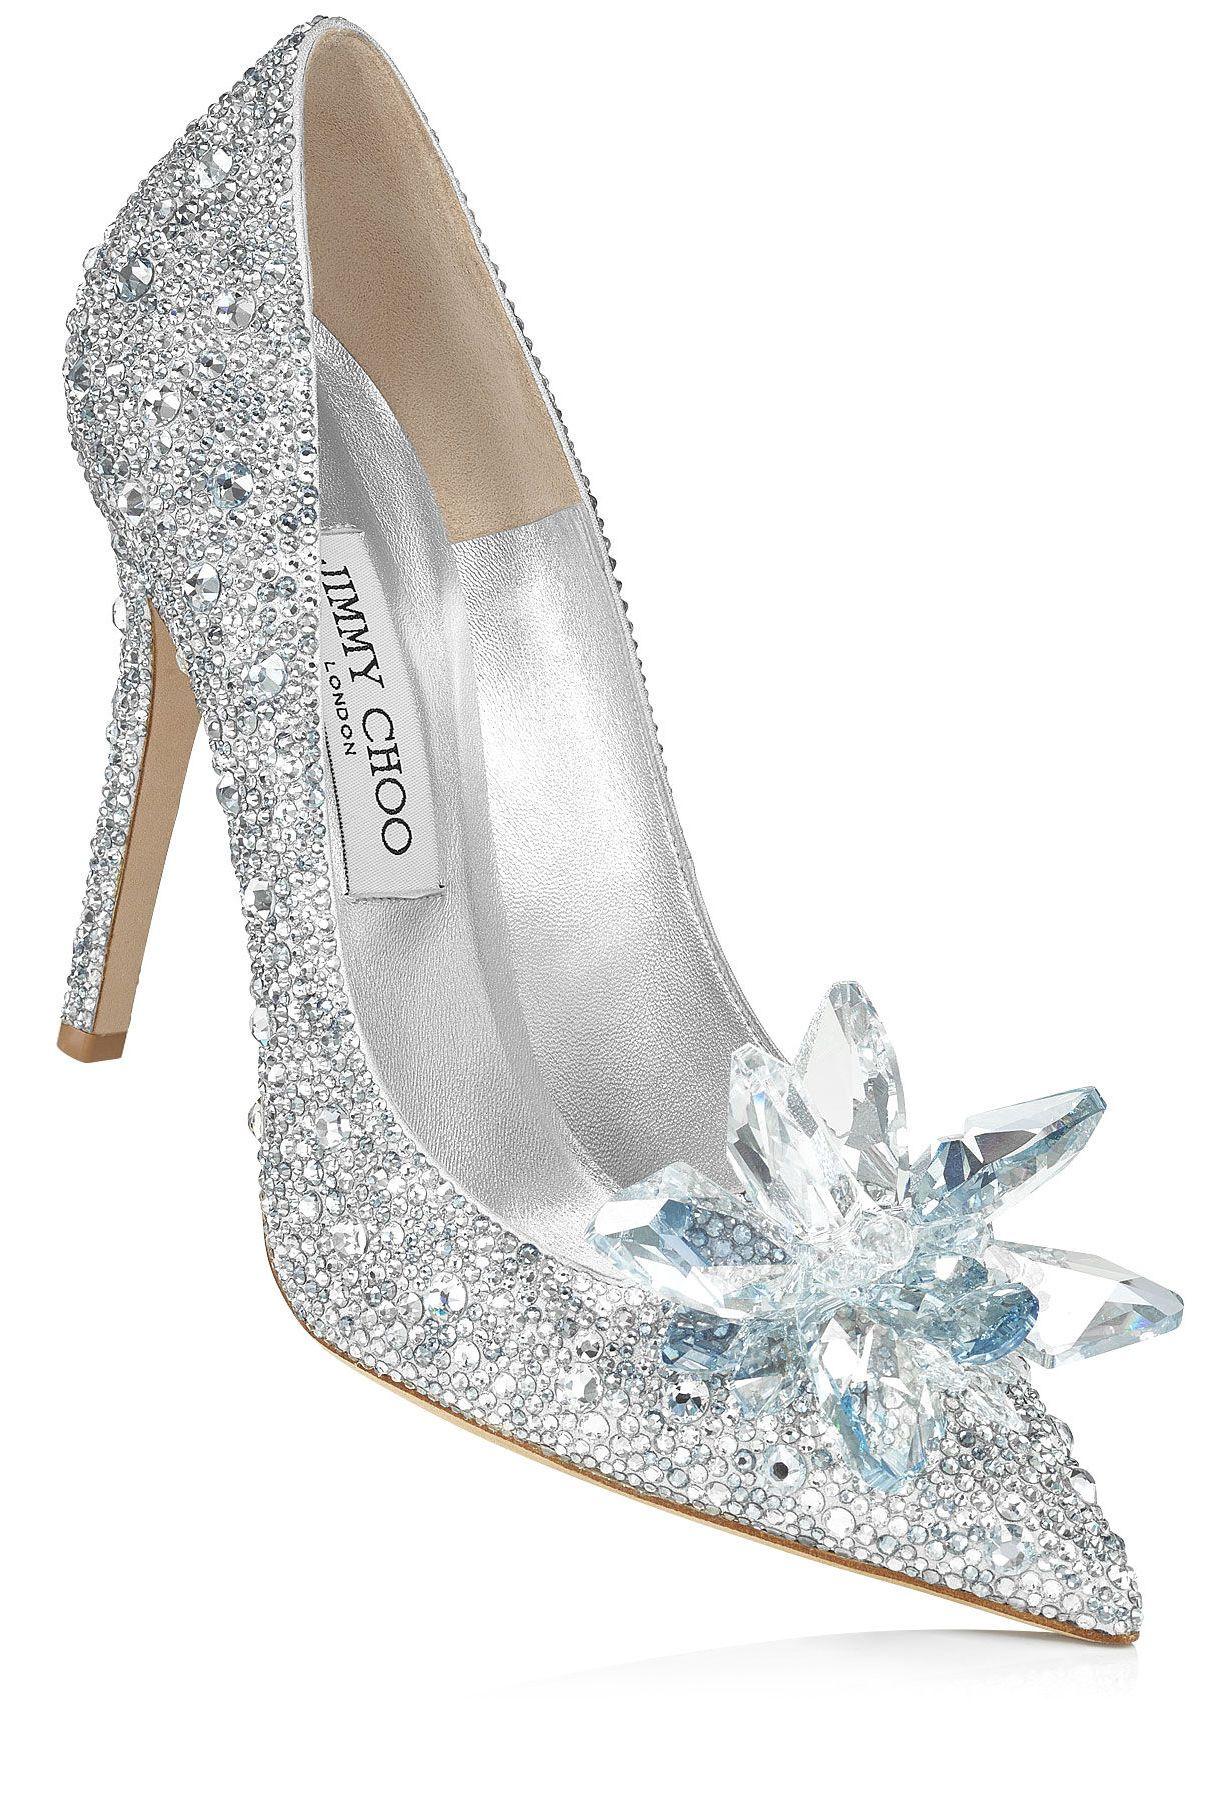 c9f2277eae53 Crystal Covered Pointy Toe Pump  Cinderella Slipper  by  Jimmy Choo ...